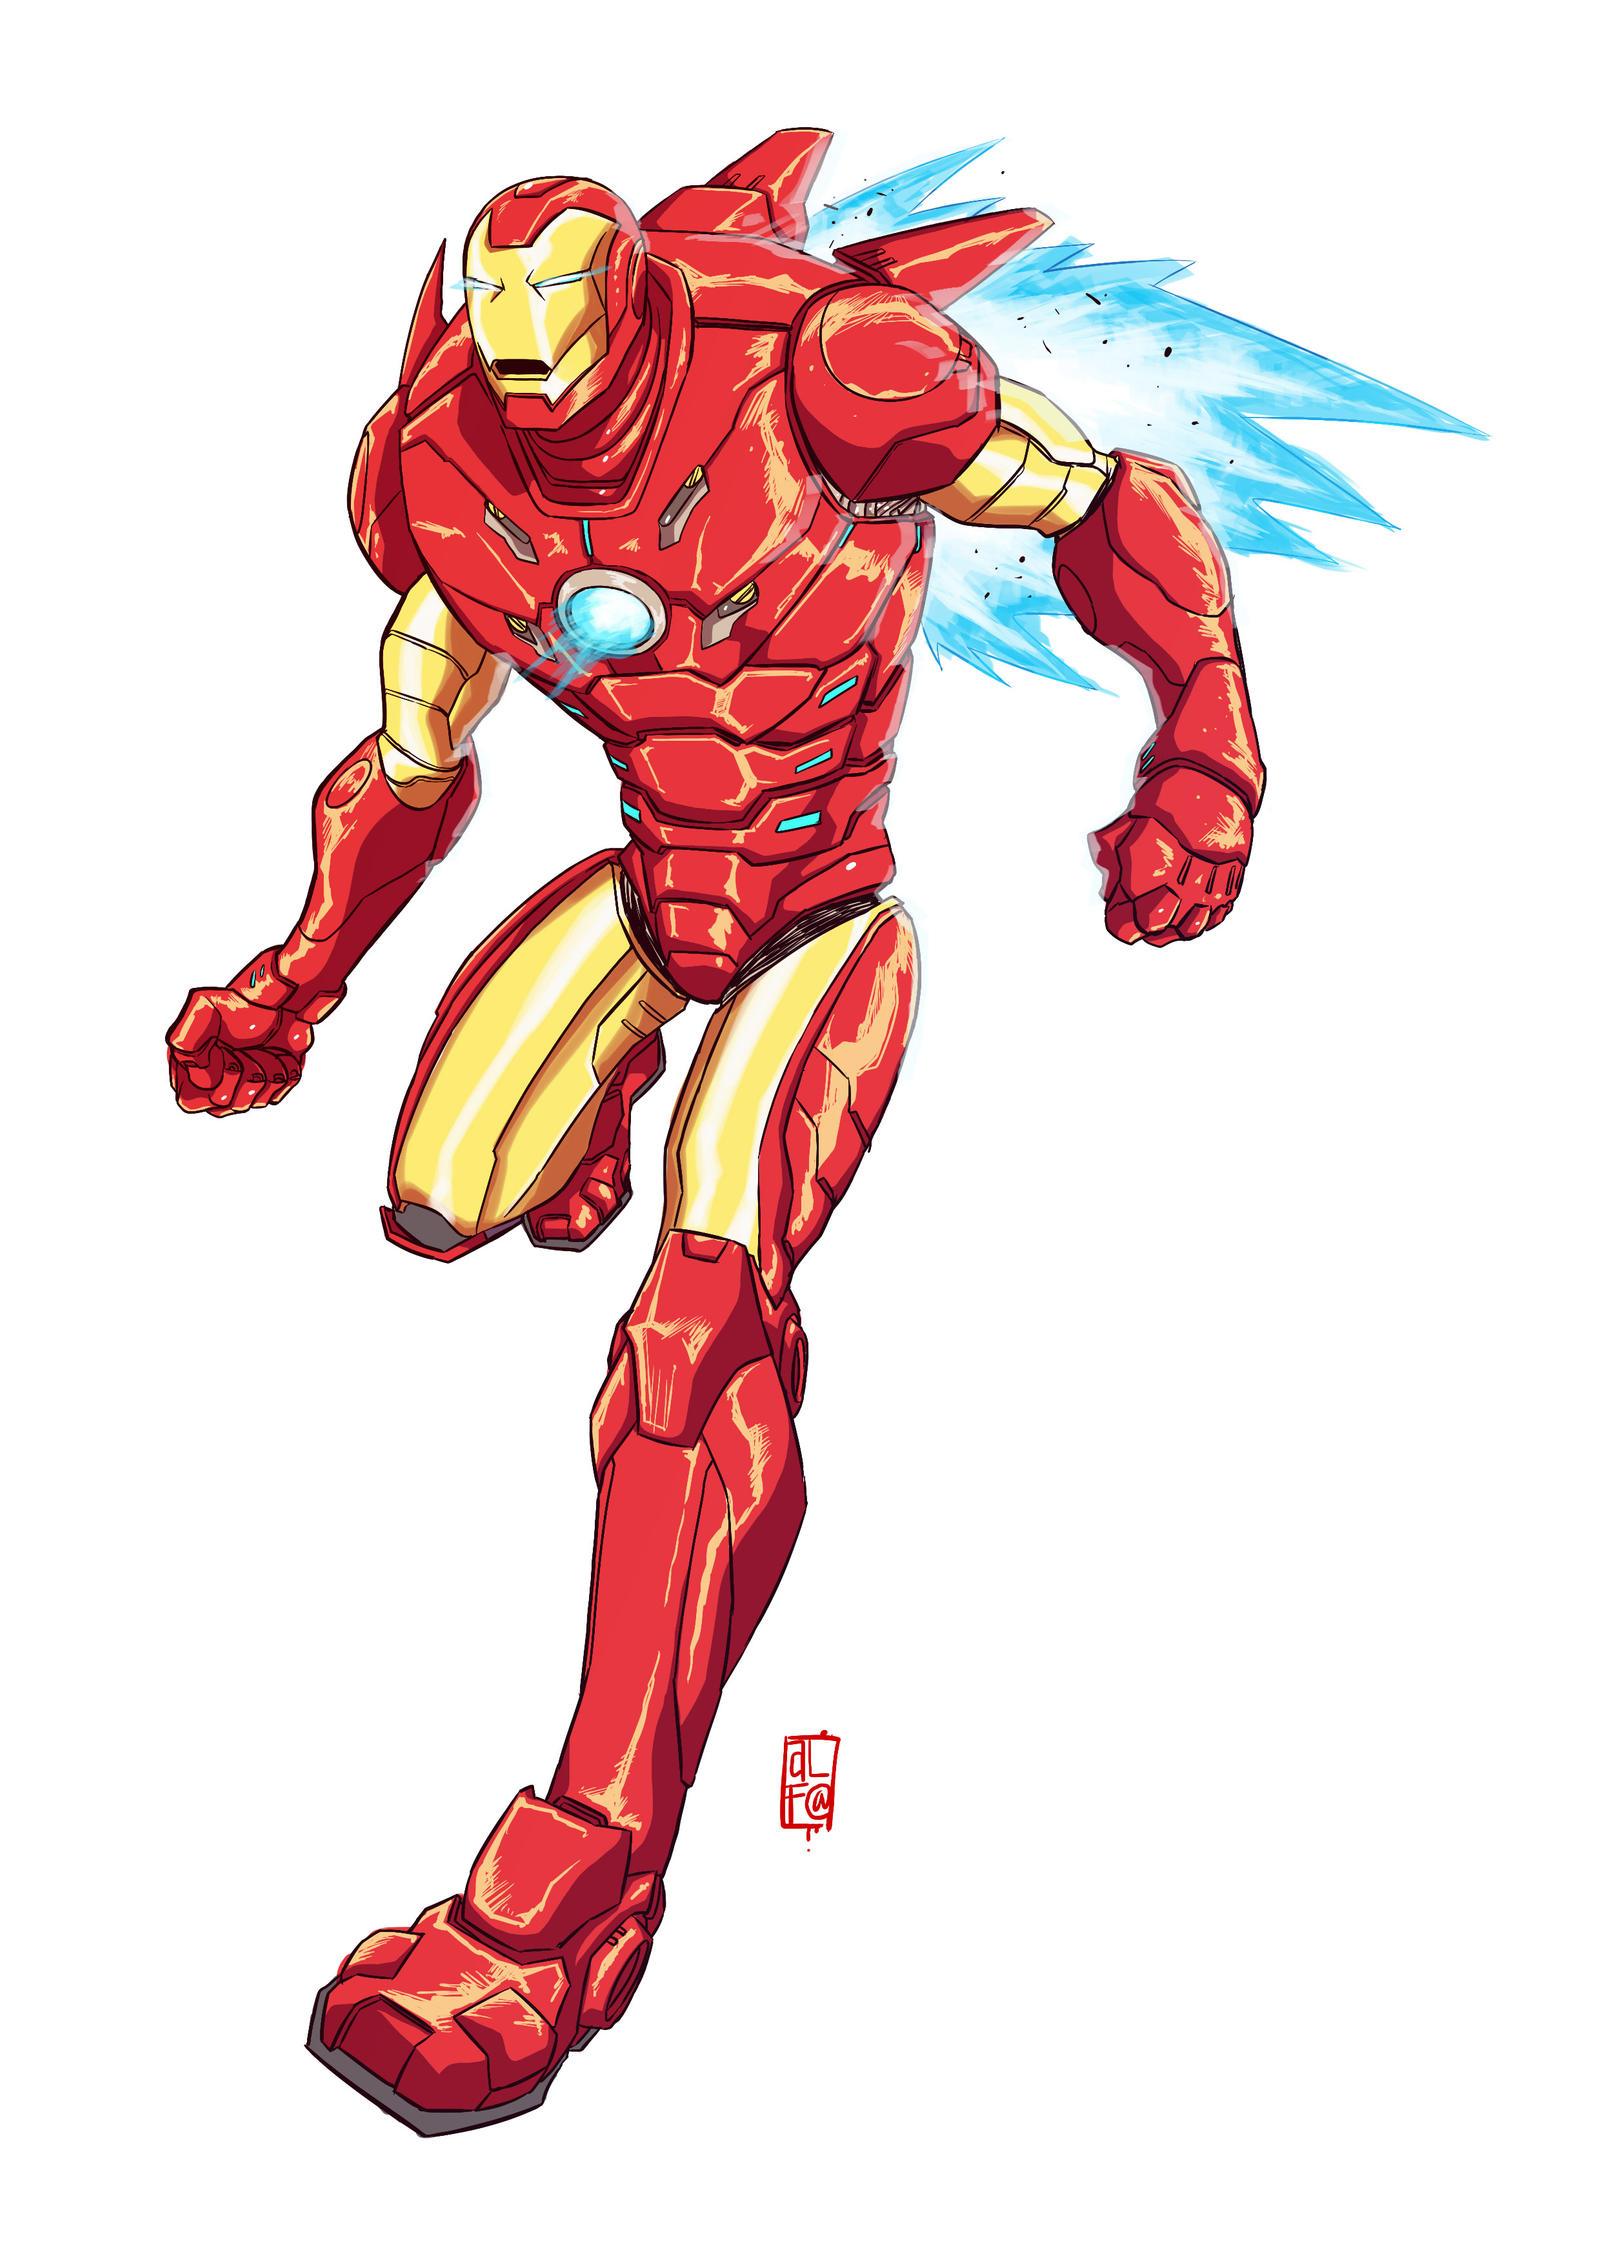 Iron man clr by ultrachicken